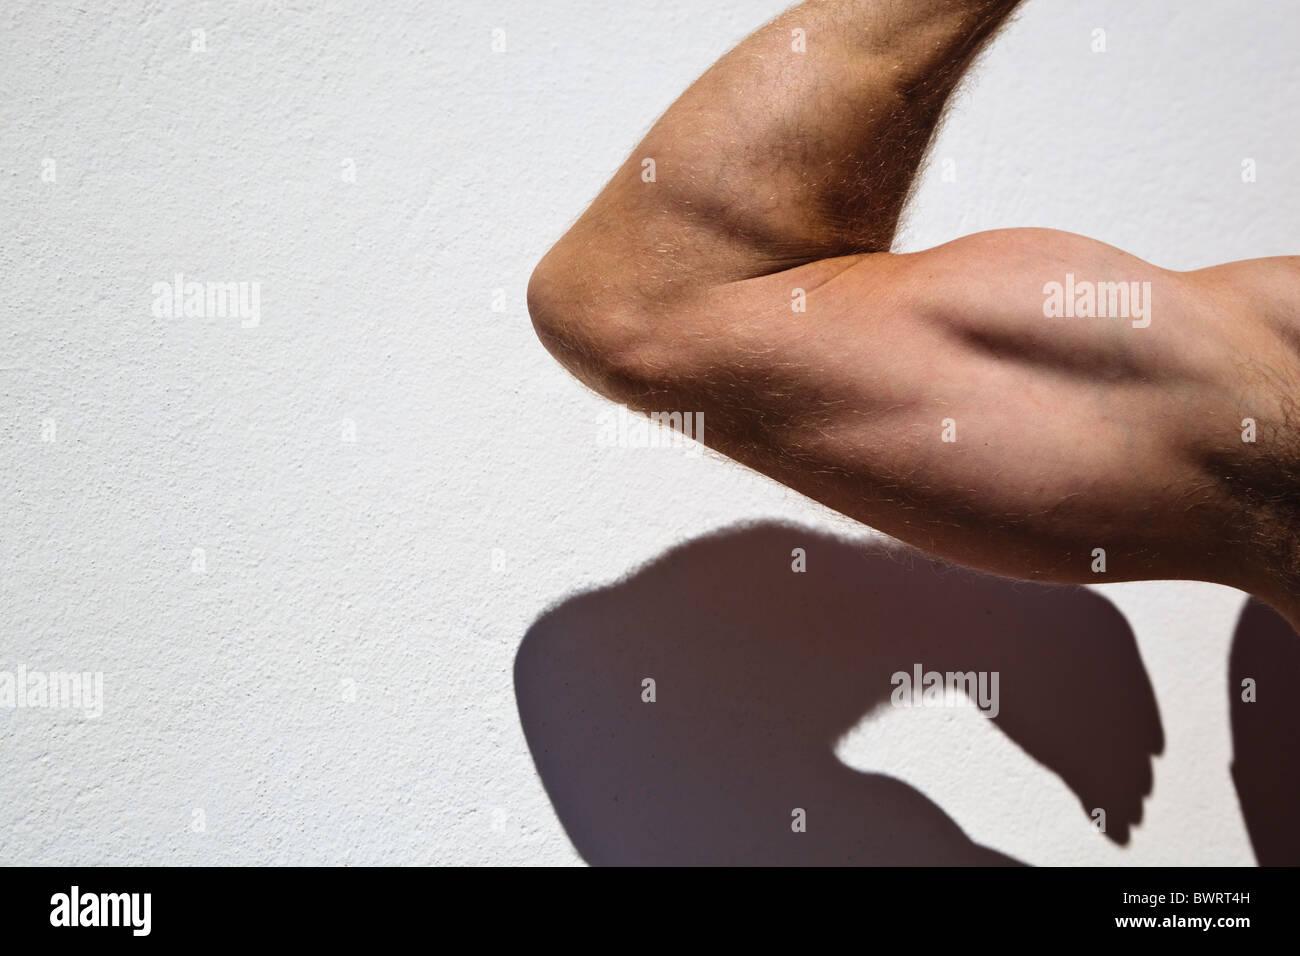 Triceps Stockfotos & Triceps Bilder - Alamy